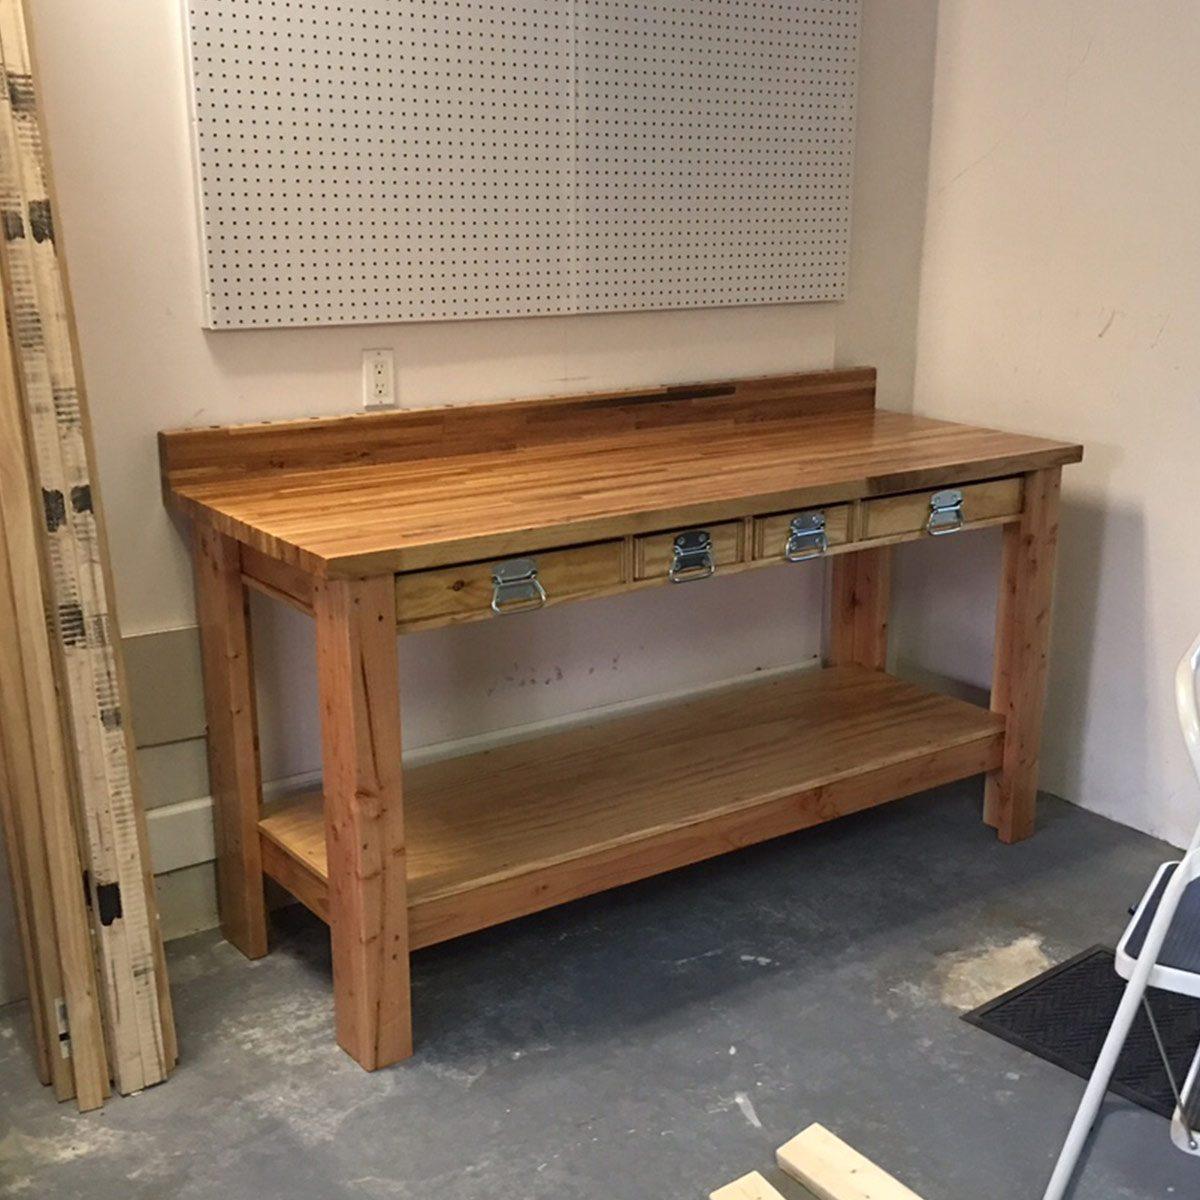 New Twist on a Classic Workbench